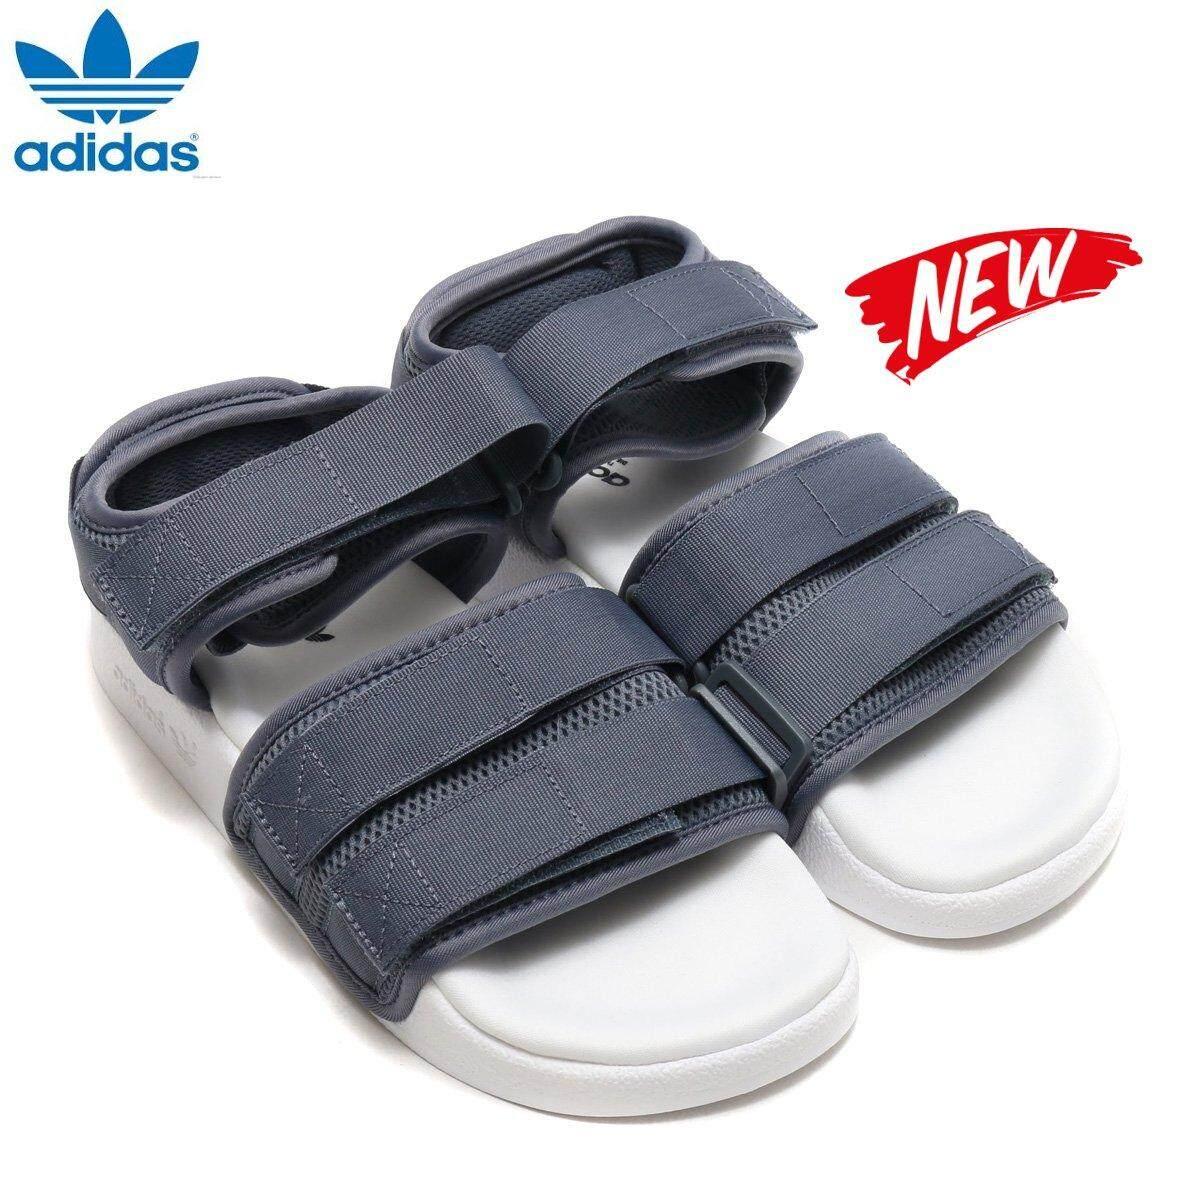 ccaa23945cf0 Adidas Original New Unisex Adilette Sandal CQ2672 Grey White 100% Original